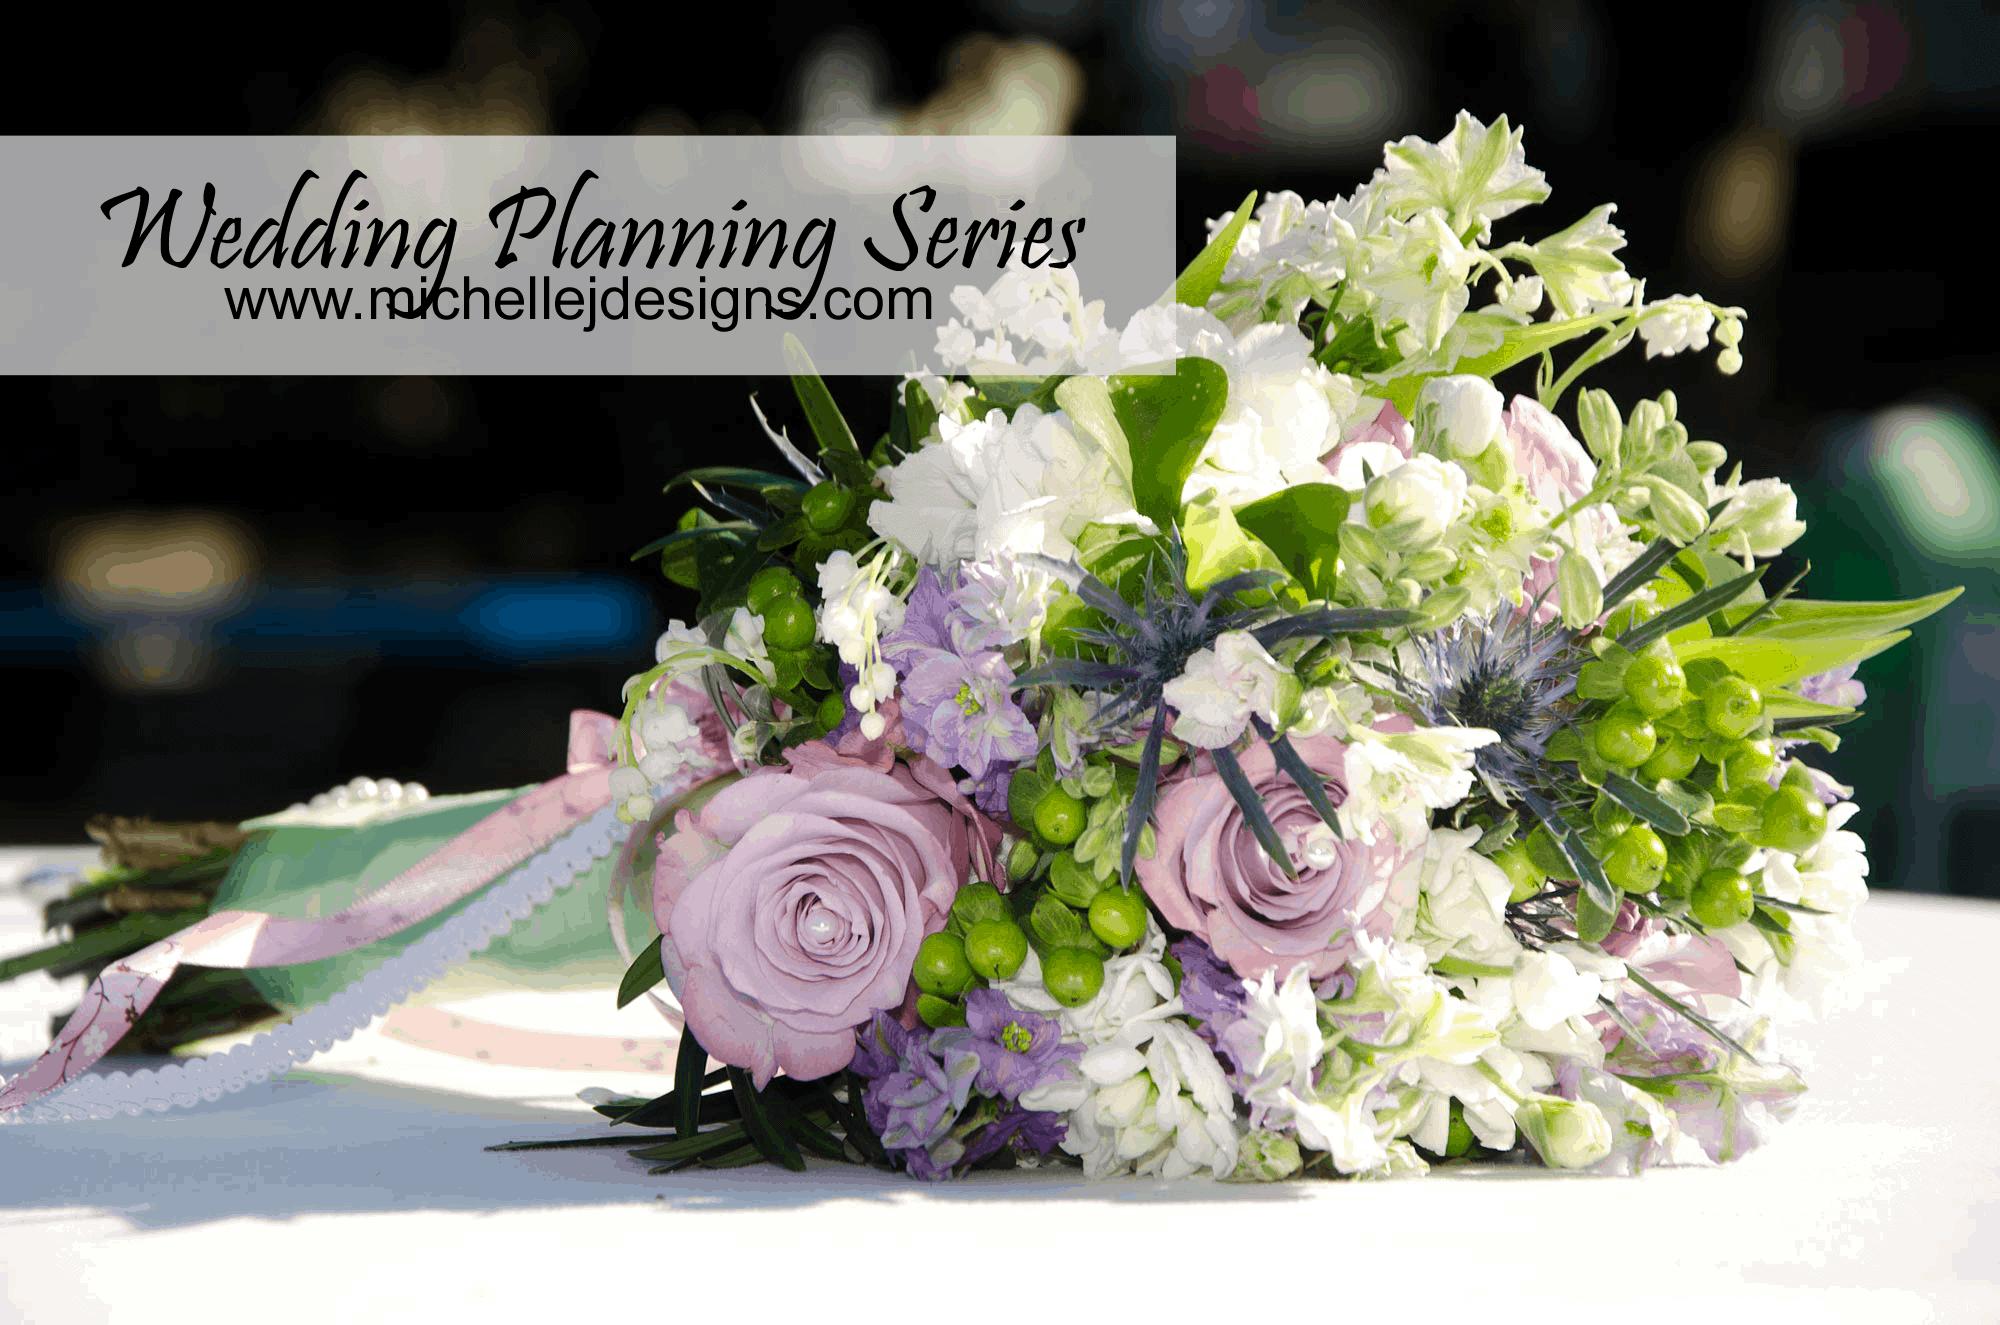 wedding budget planners series part 2 michelle james designs